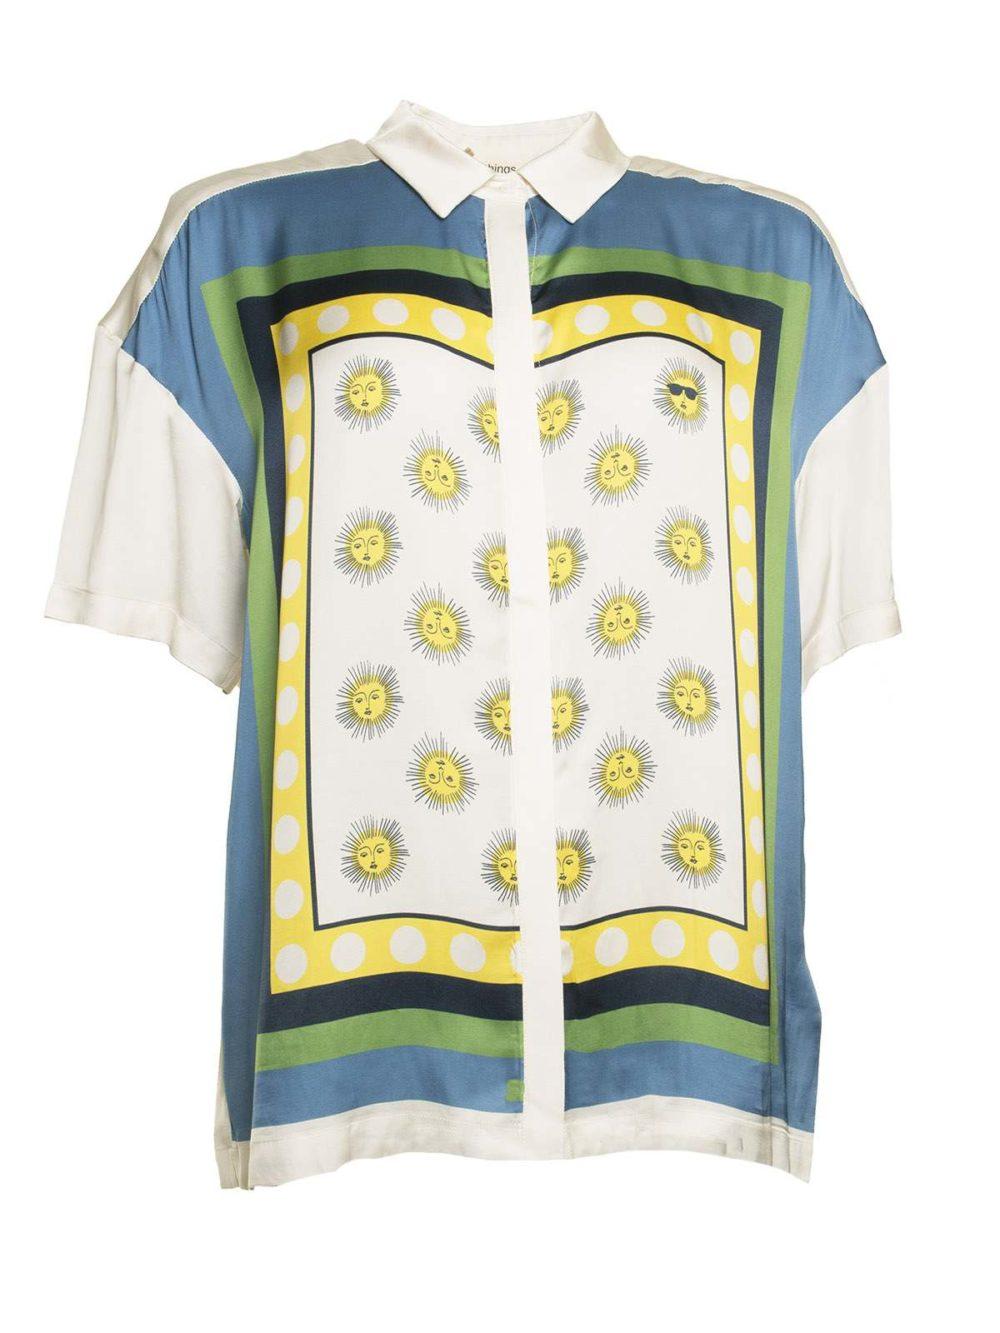 Scarf Shirt Nice Things Katie Kerr Women's Clothing